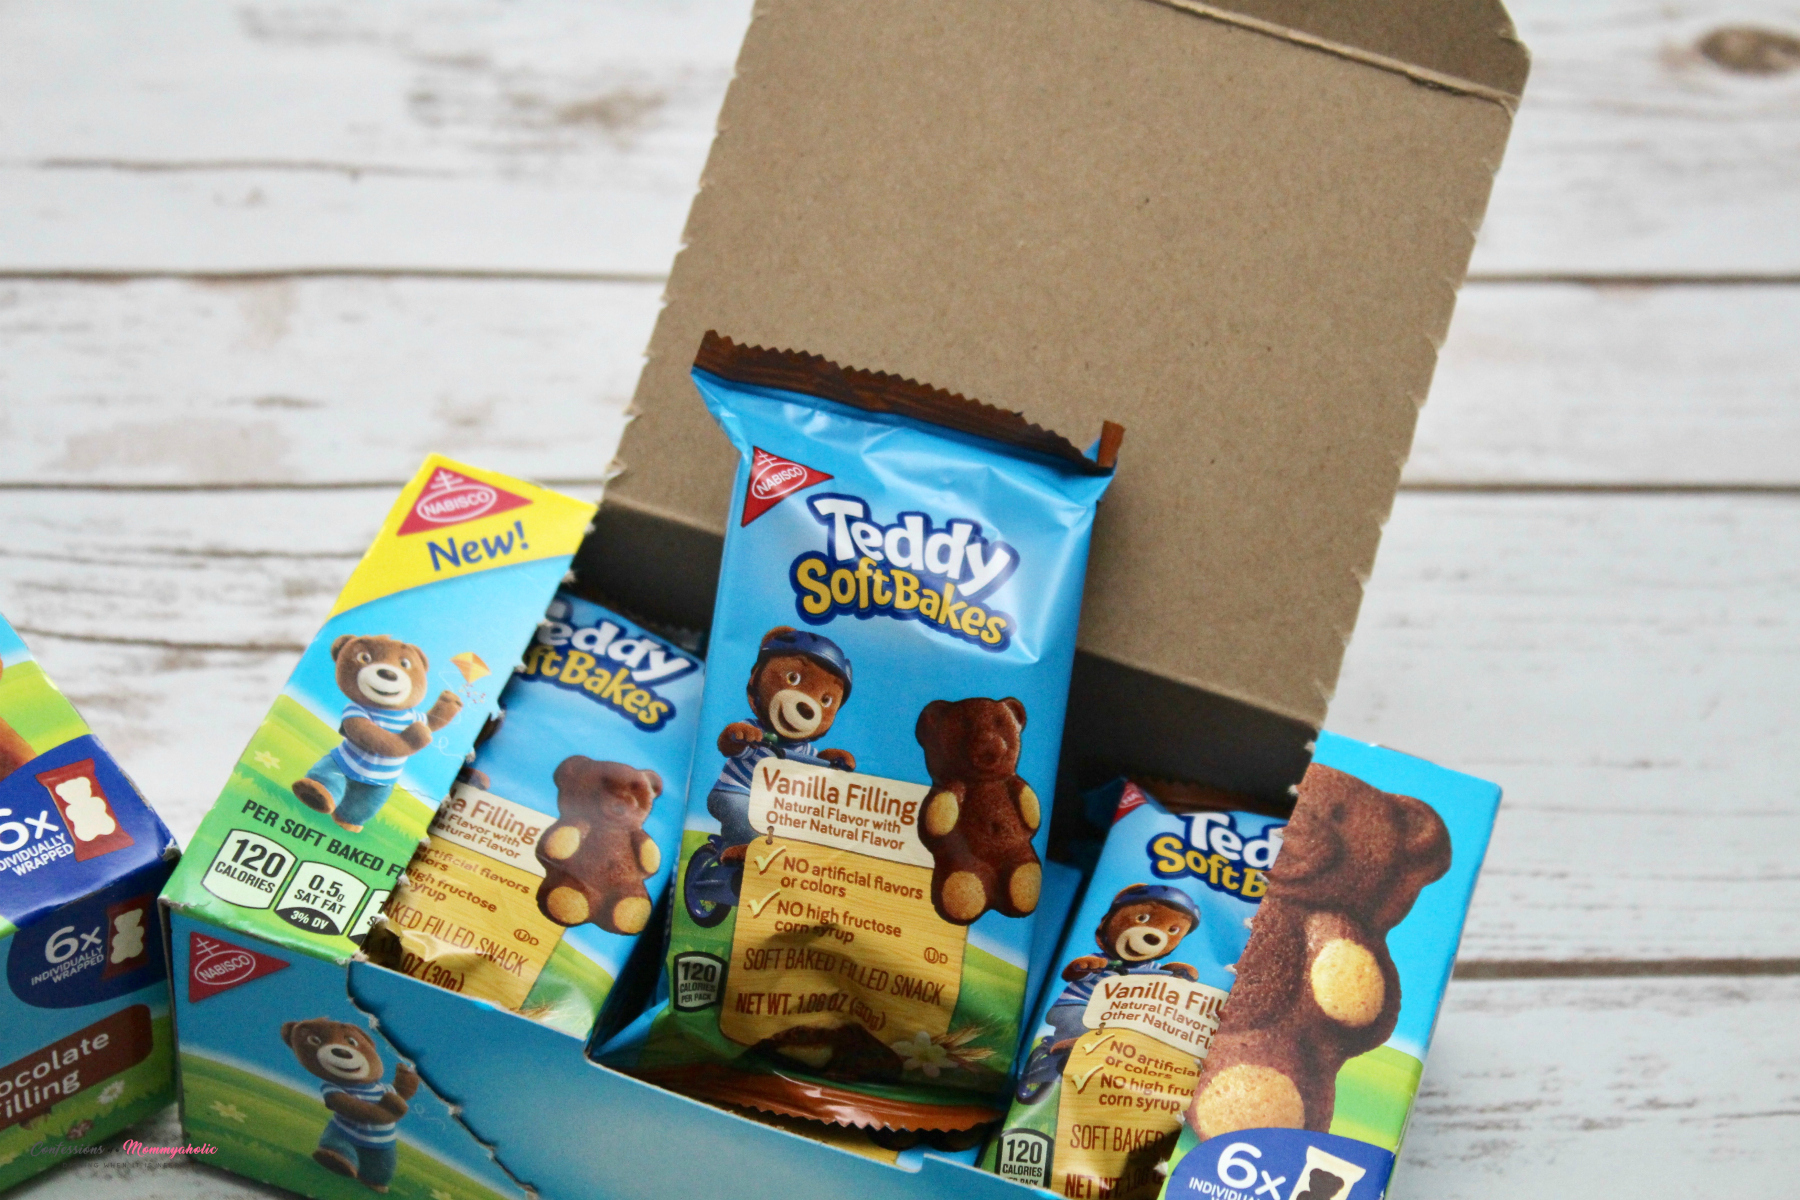 Opened Teddy Soft Bakes Box